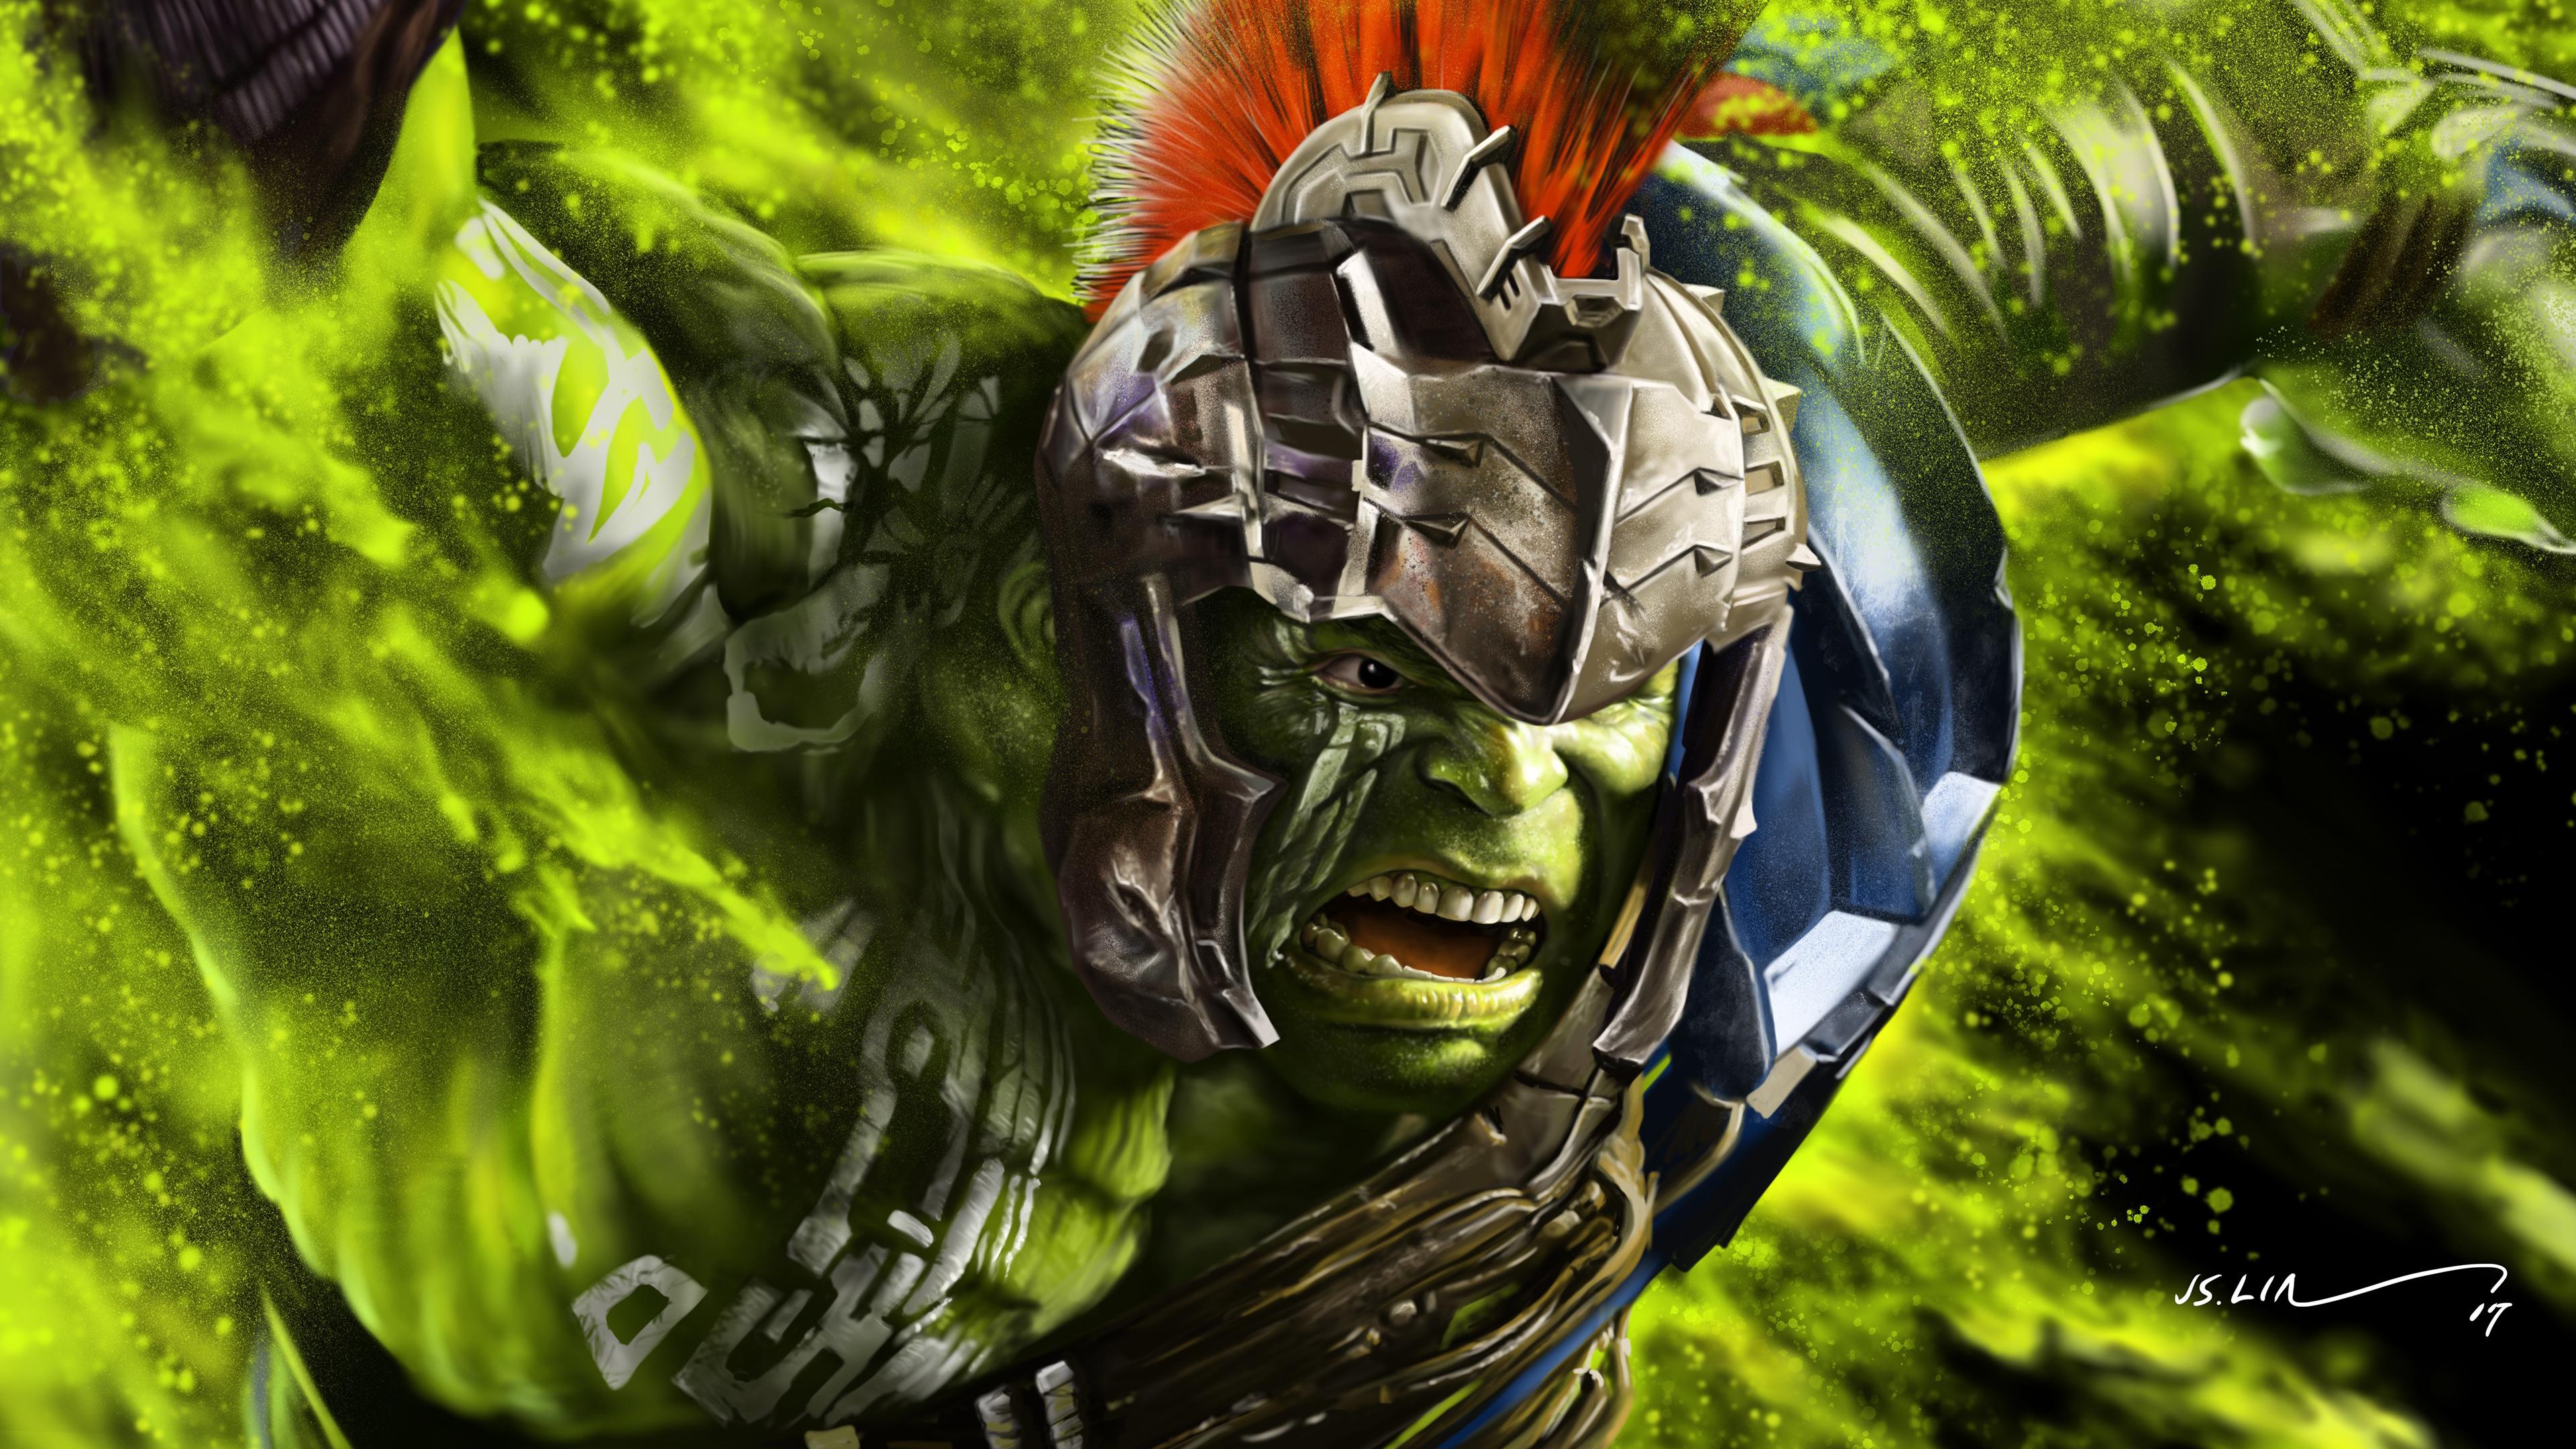 Hulk Thor Ragnarok Artwork 4K Wallpapers HD Wallpapers 3840x2160